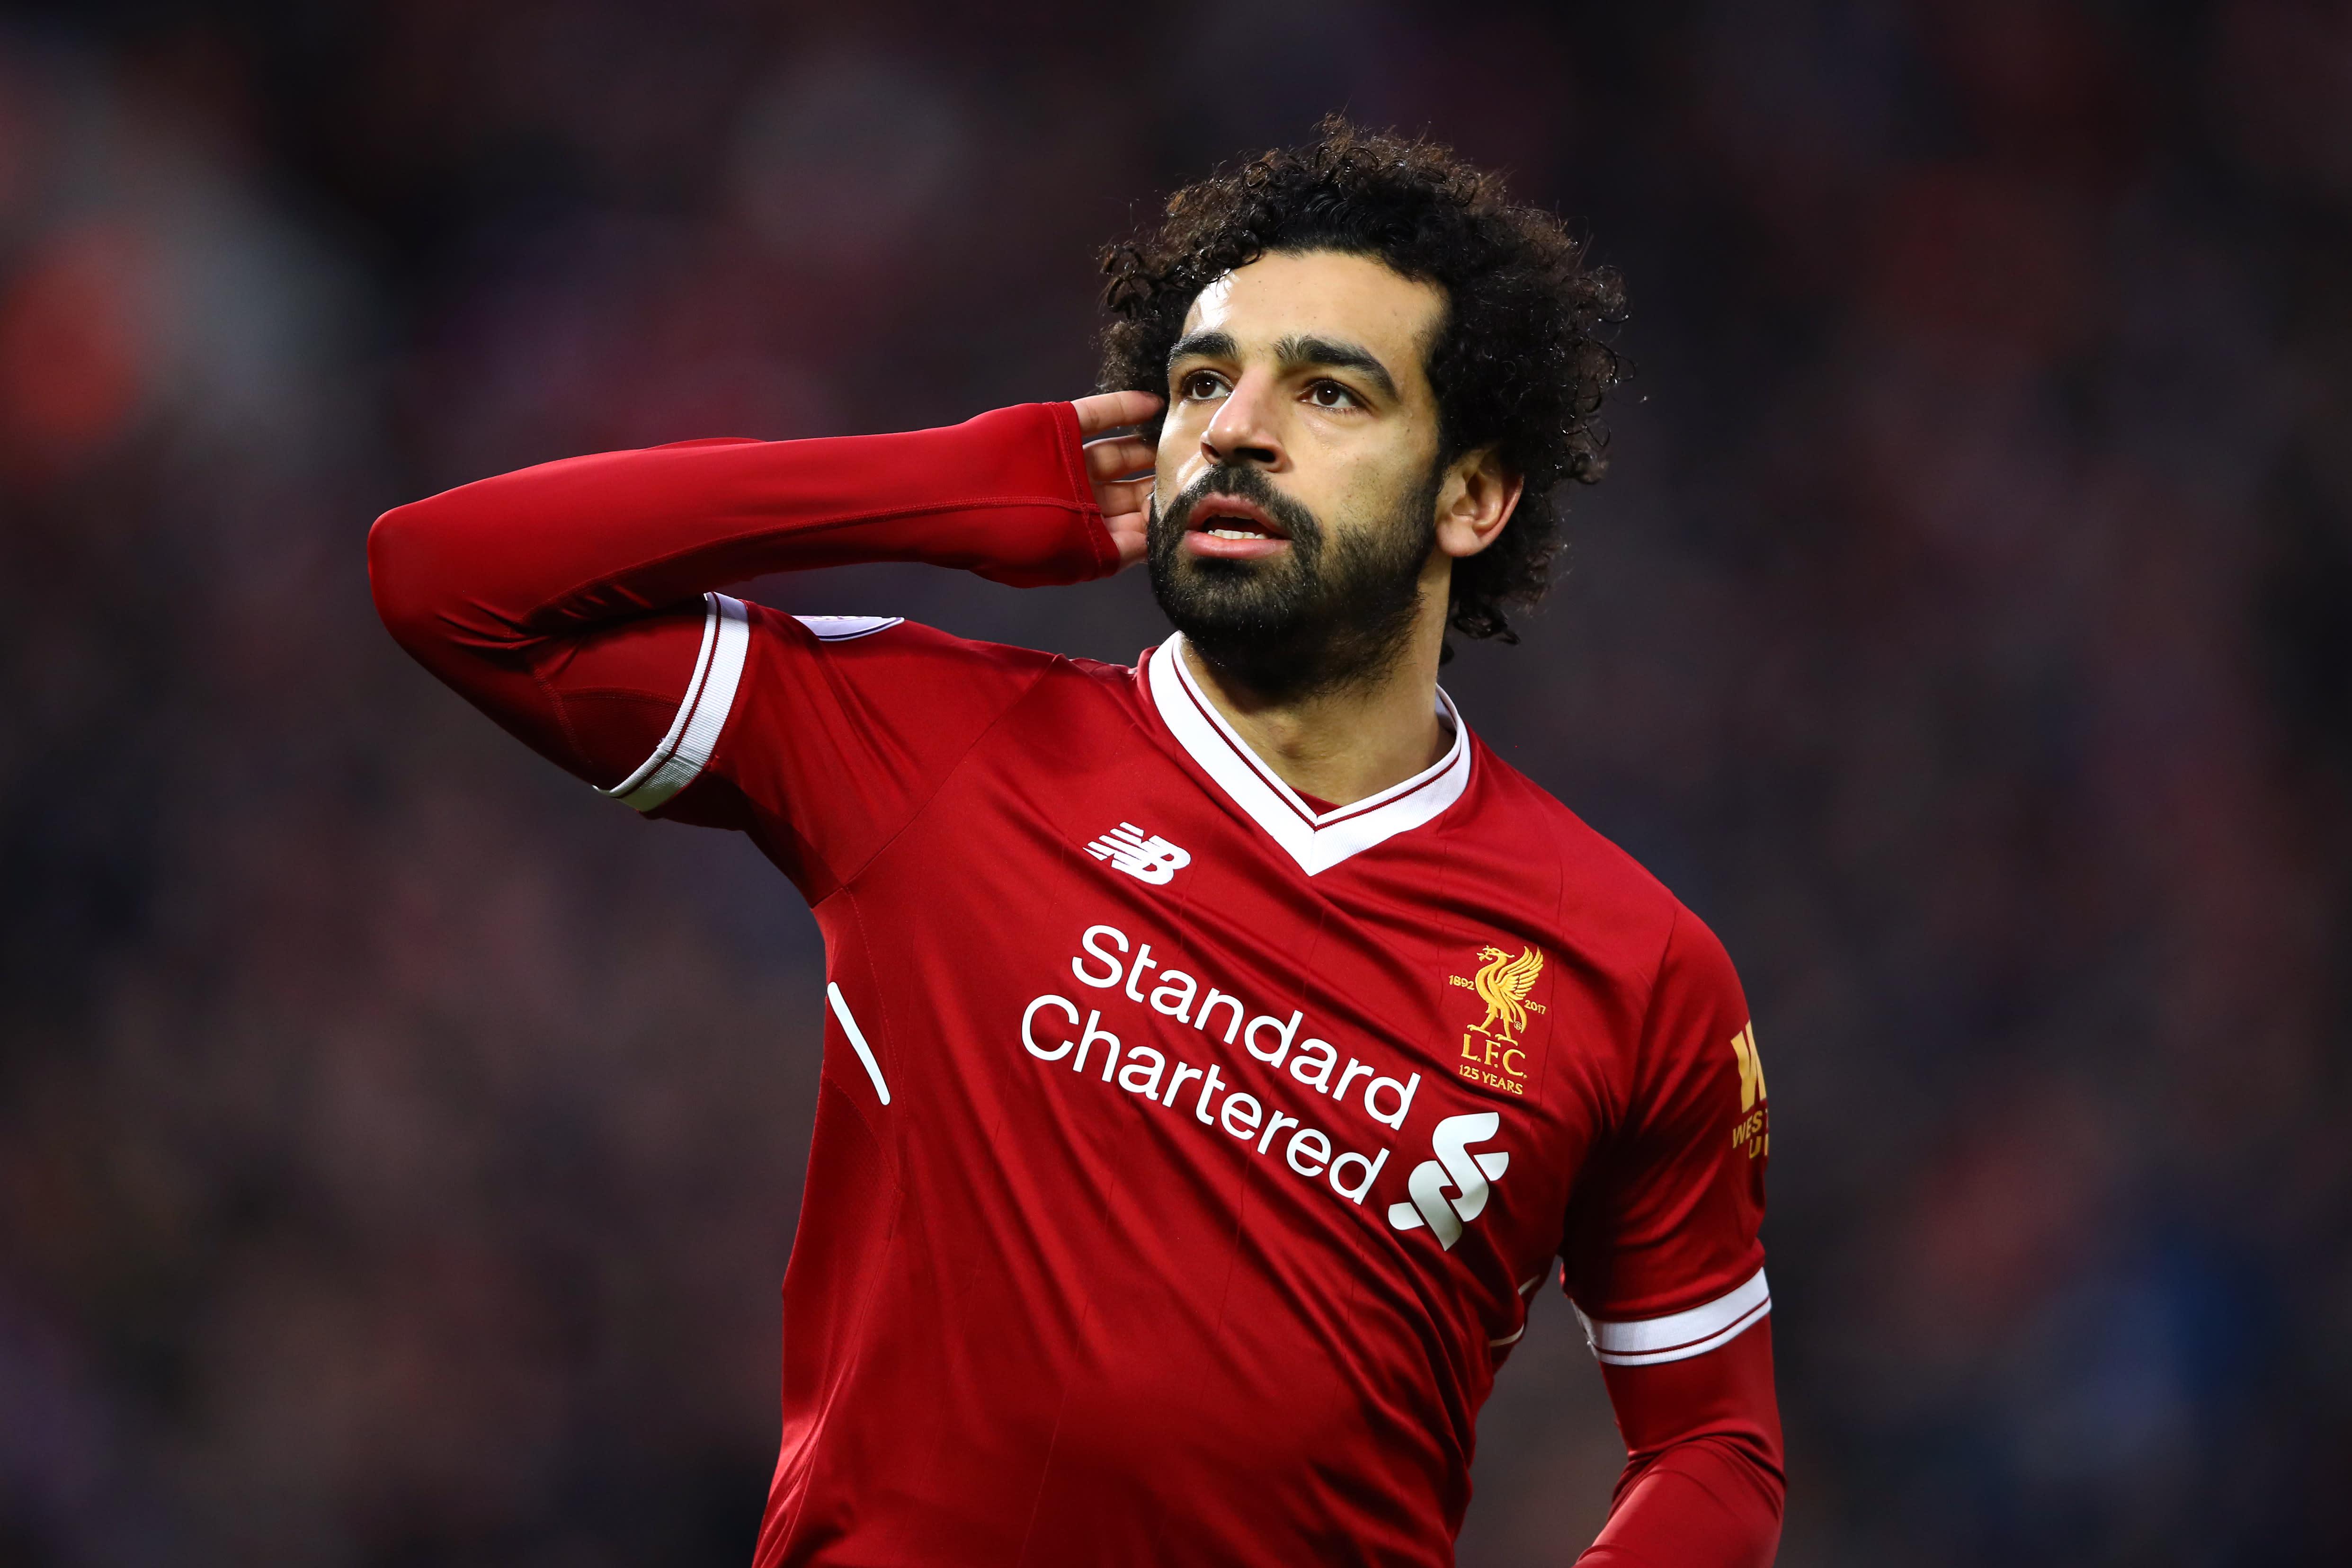 Liverpool vs Man City: TV channel, live stream, squad news & preview